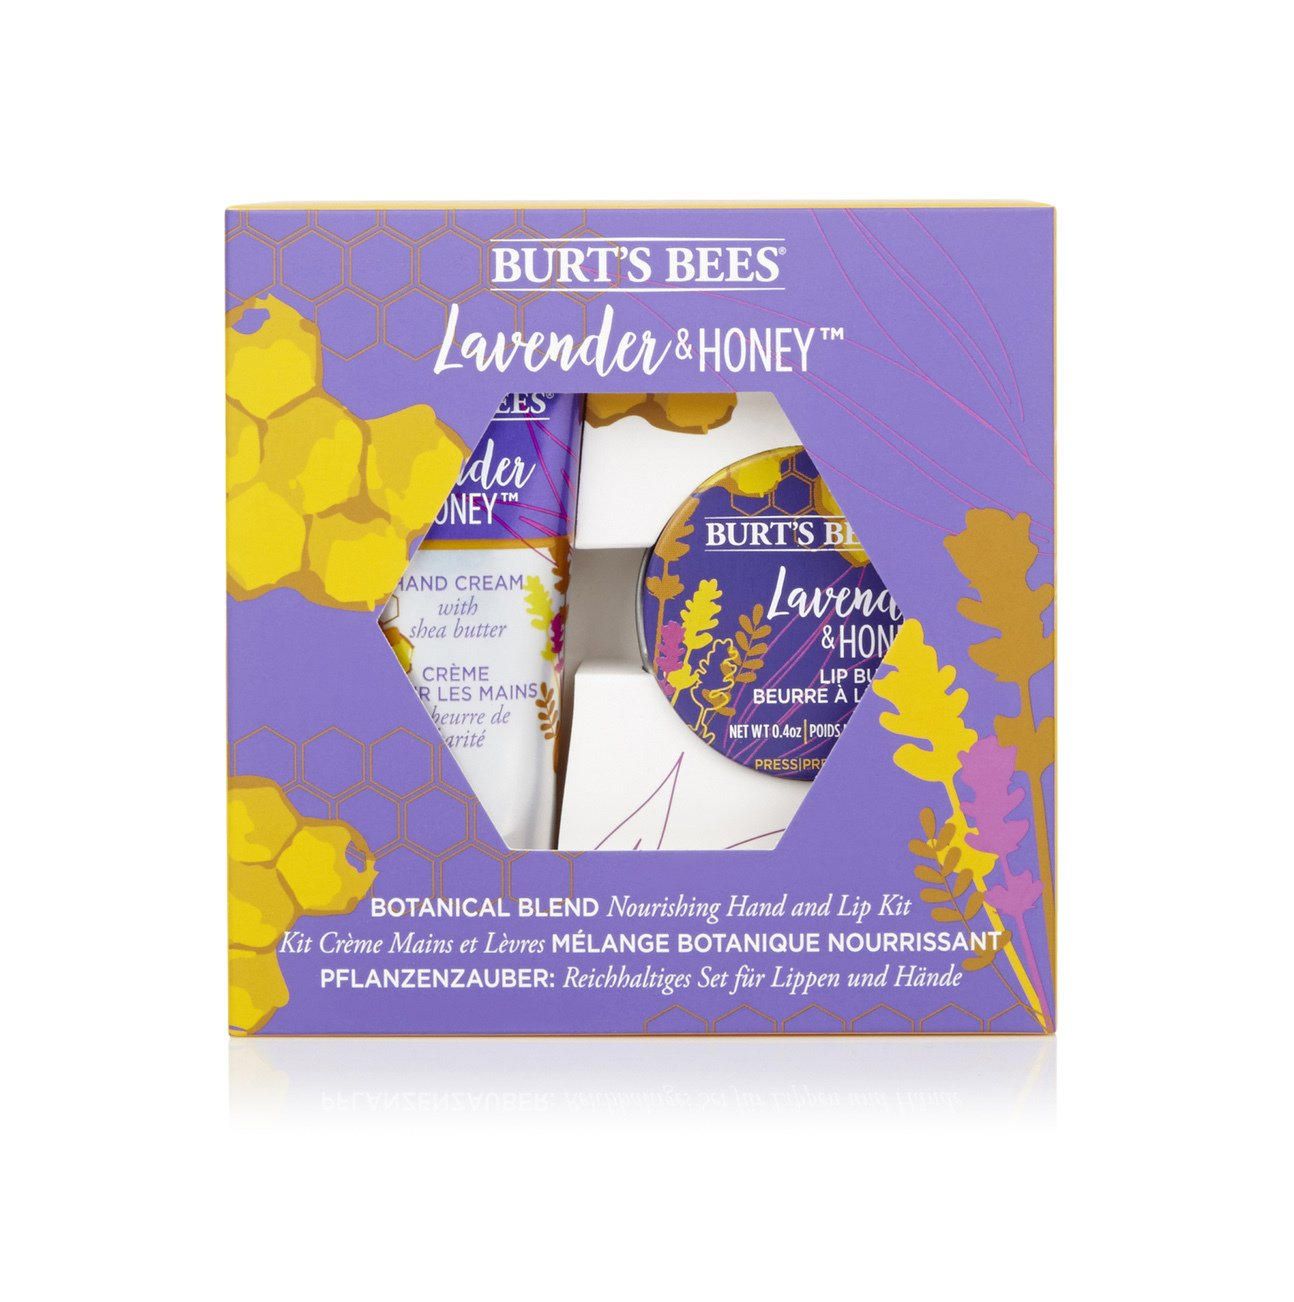 Burt's Bees Lavender Honey Hand & Lip Gift Set